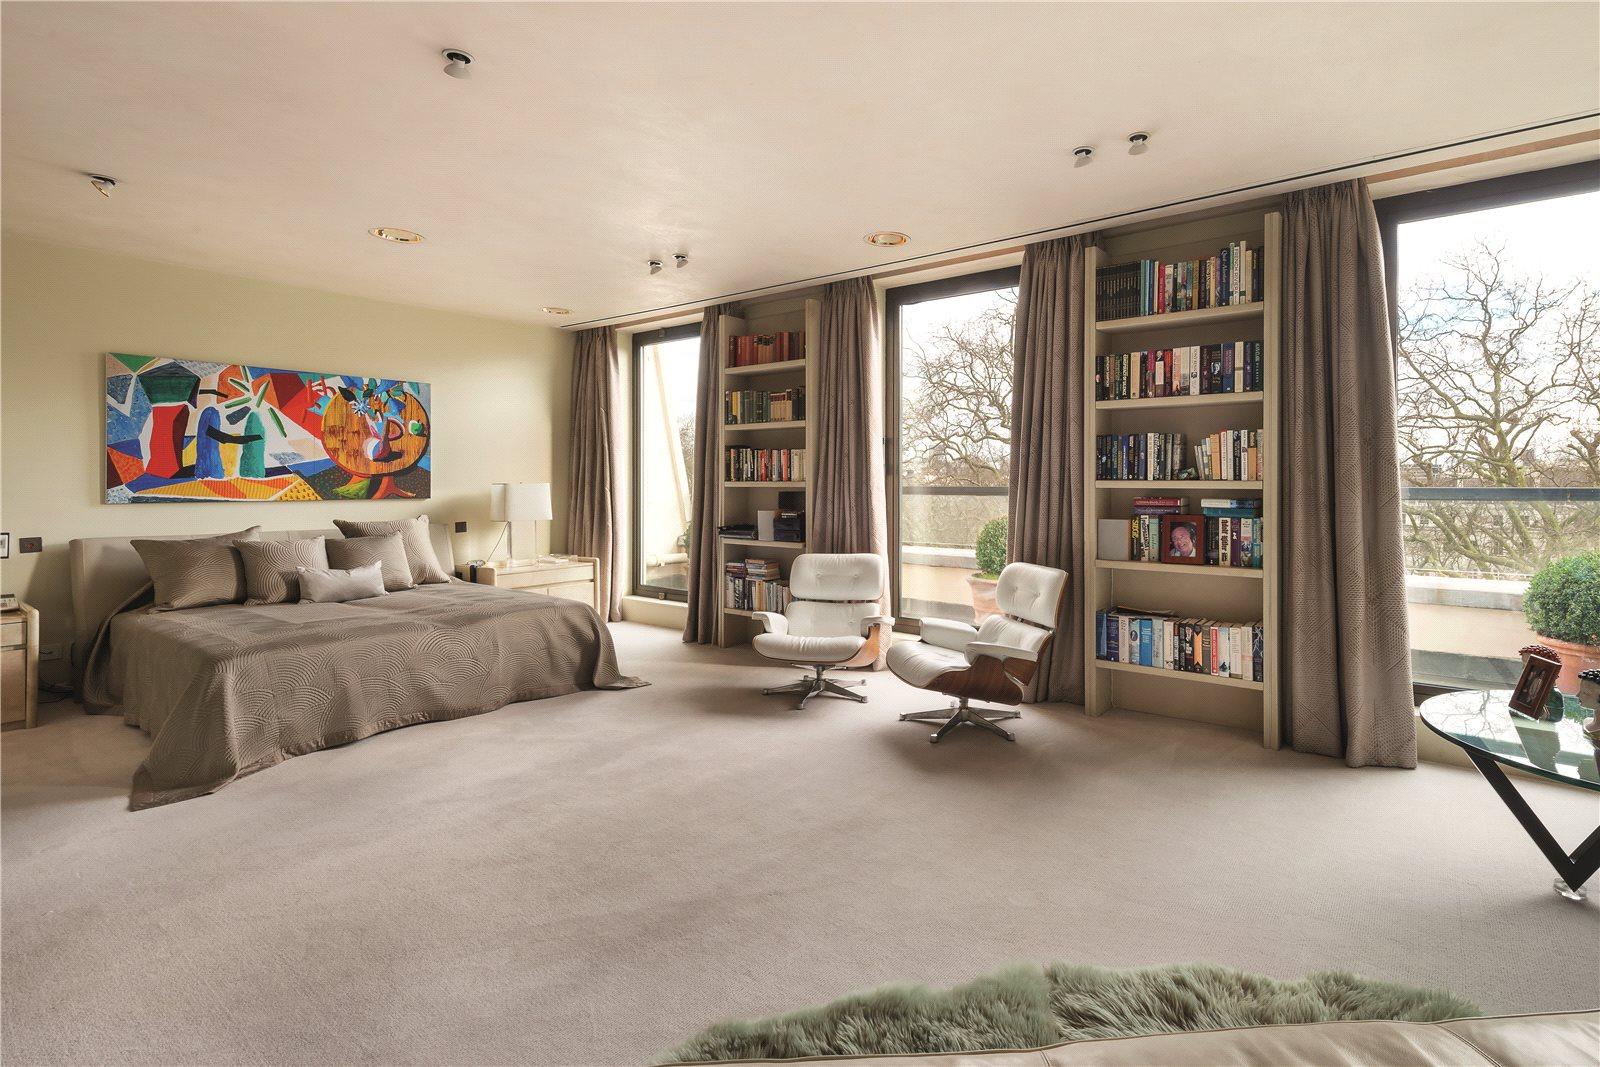 Apartments residences for sale at cork street mayfair london w1s - Stadsregio Arnhem Nijmegen Luxury Real Estate For Sale Christie S International Real Estate